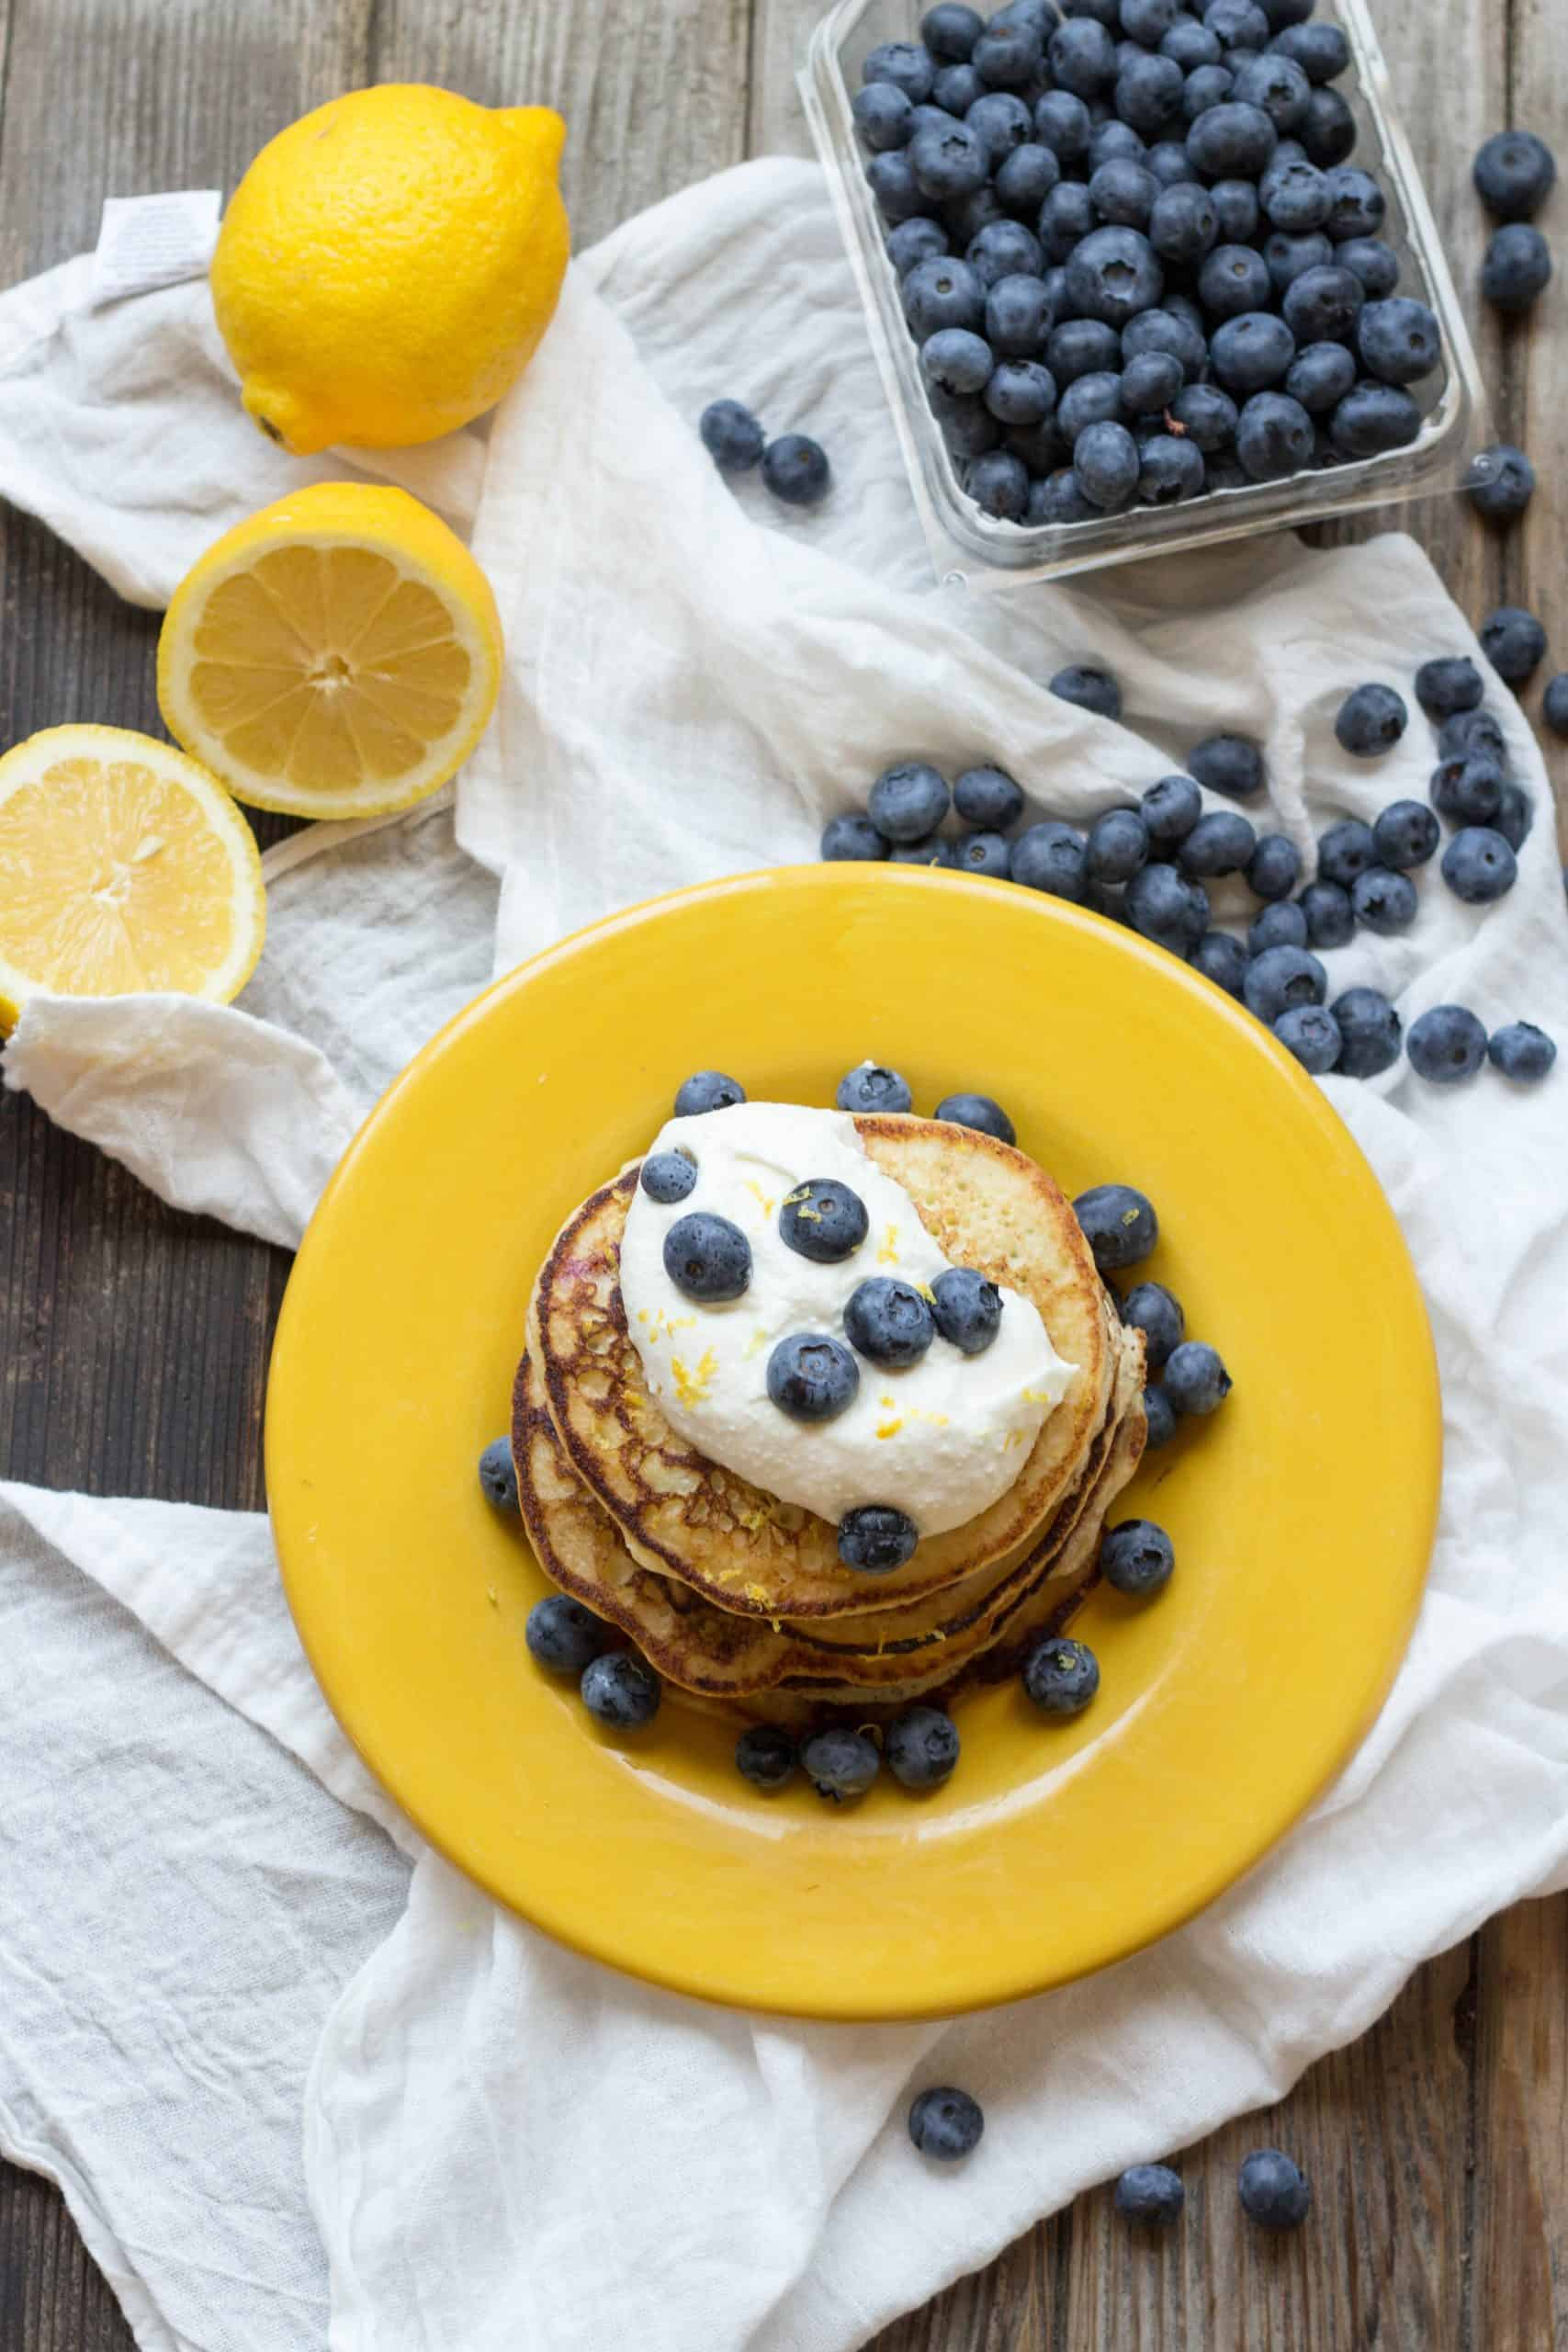 Lemon Blueberry Ricotta Pancakes (Video!)